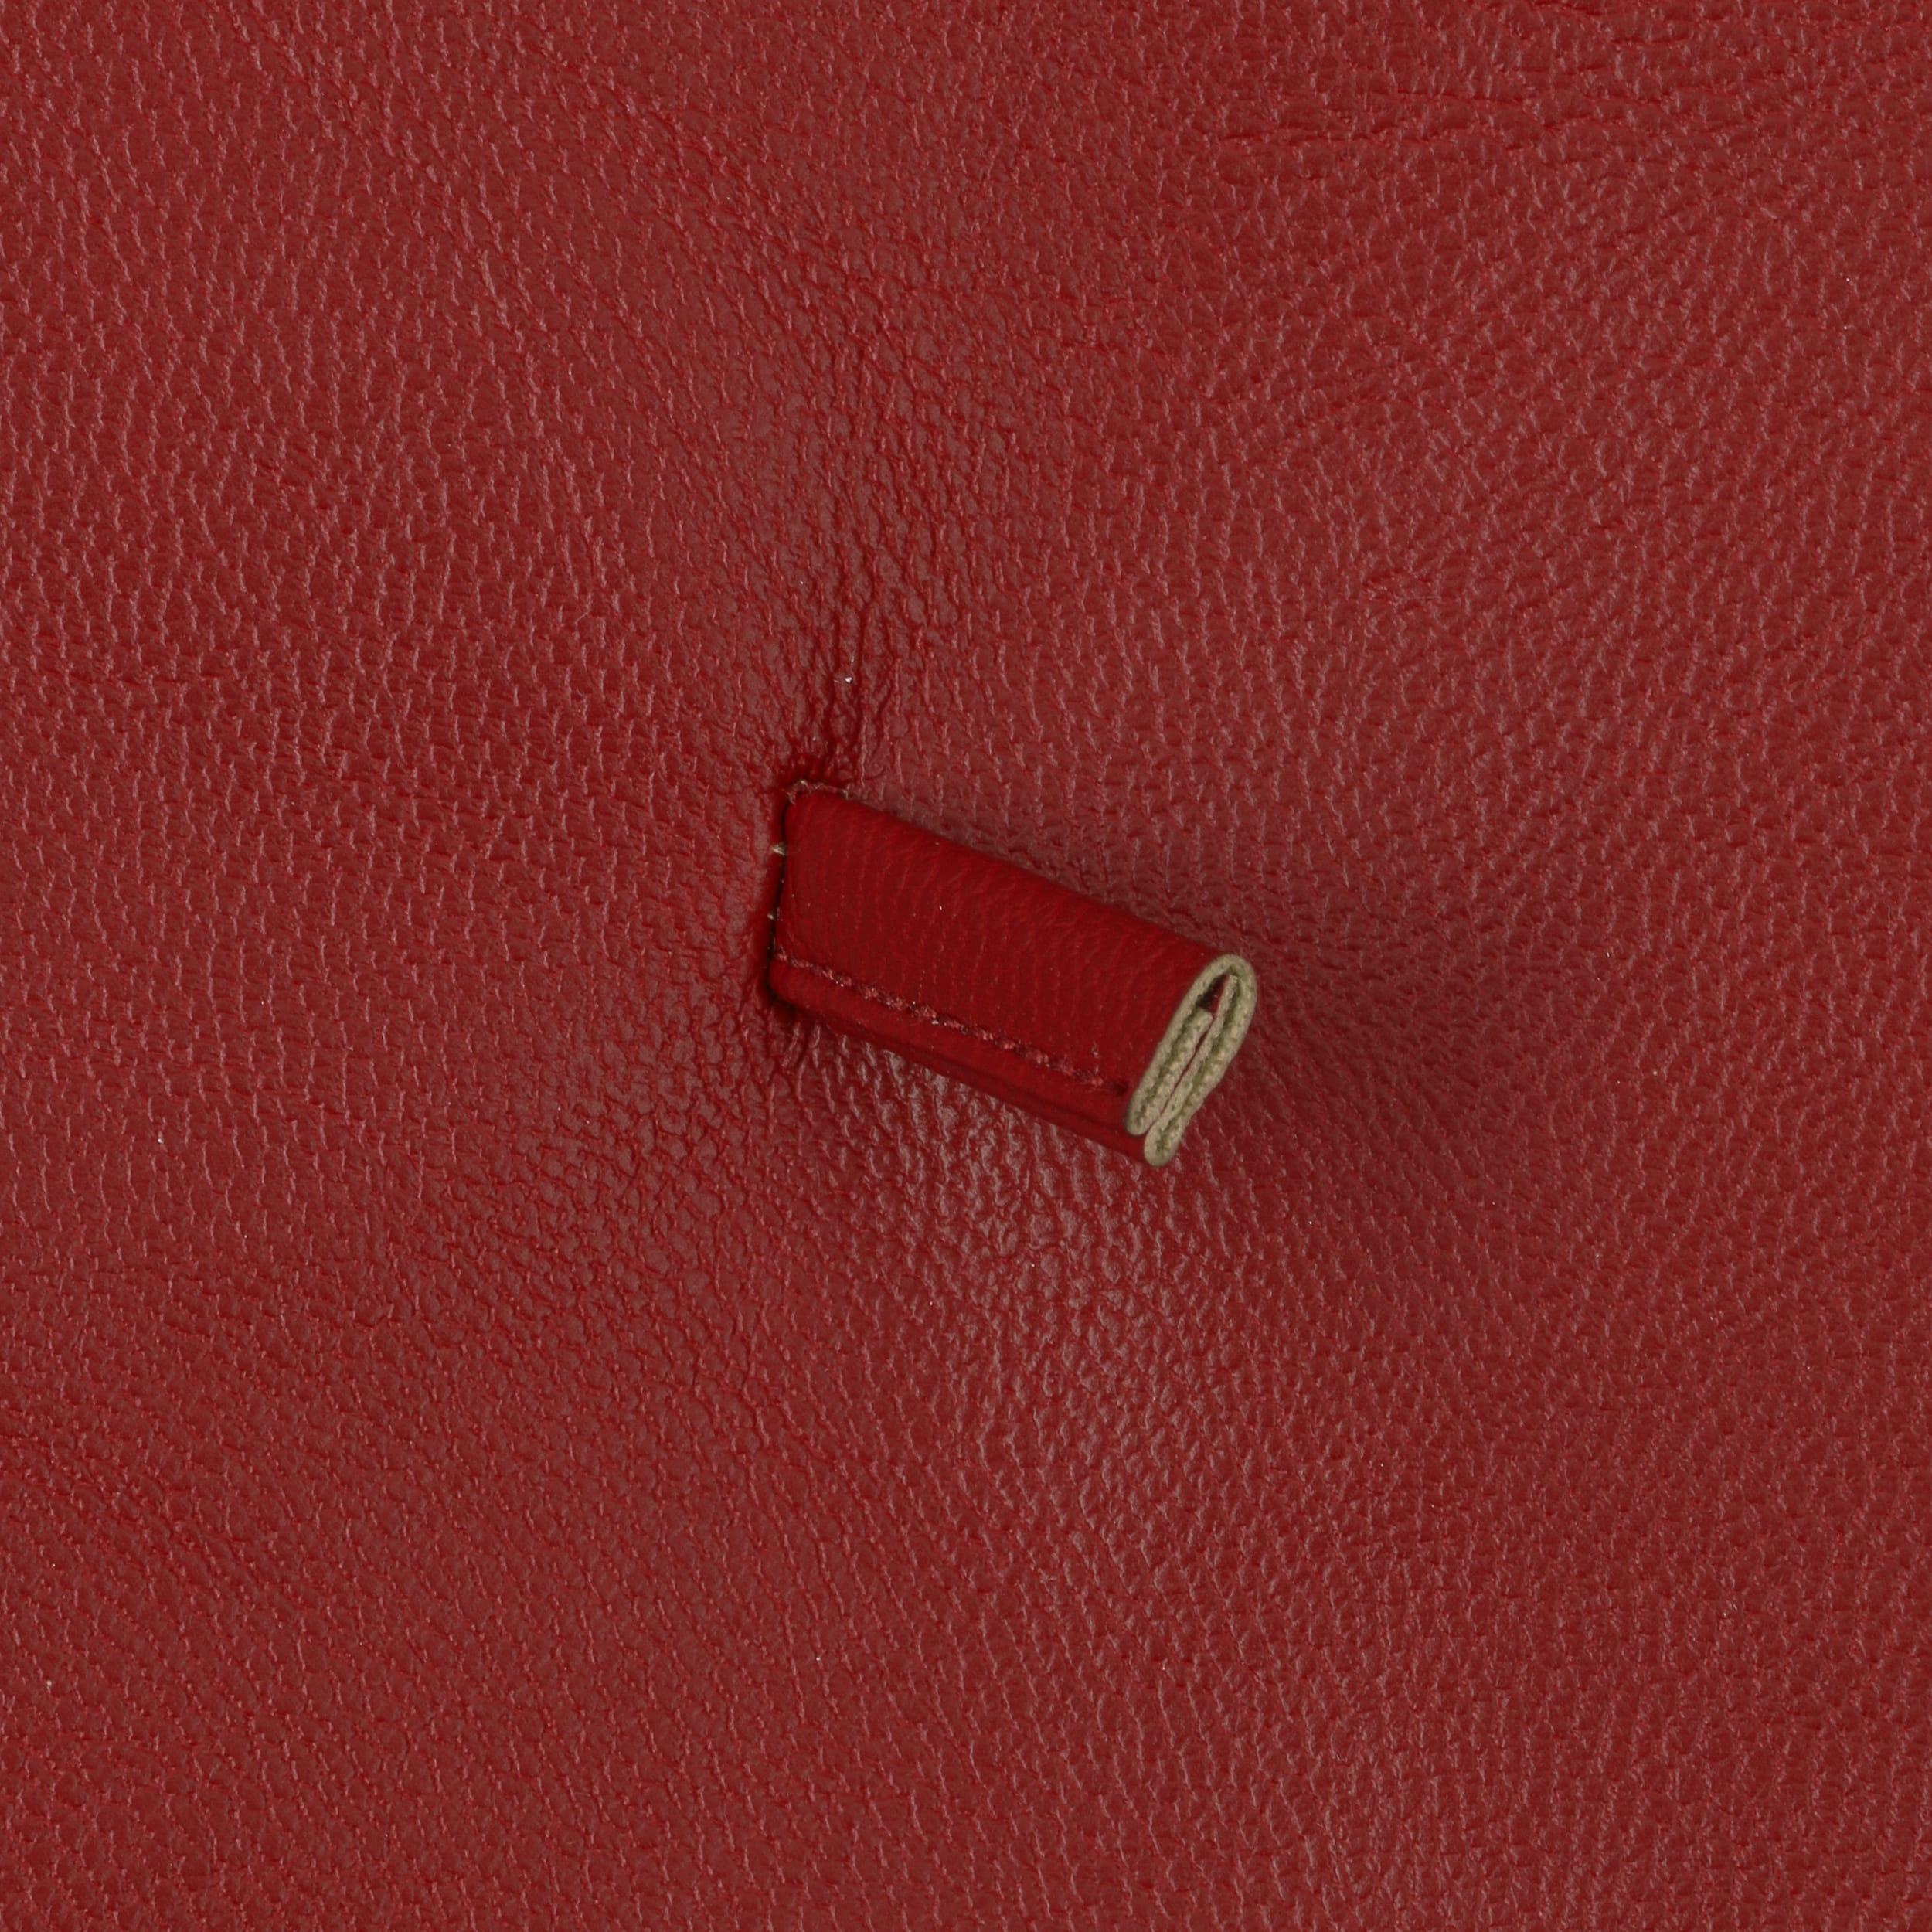 7d67aa2883572 ... Faux Leather Beret by Lipodo - bordeaux 3 ...